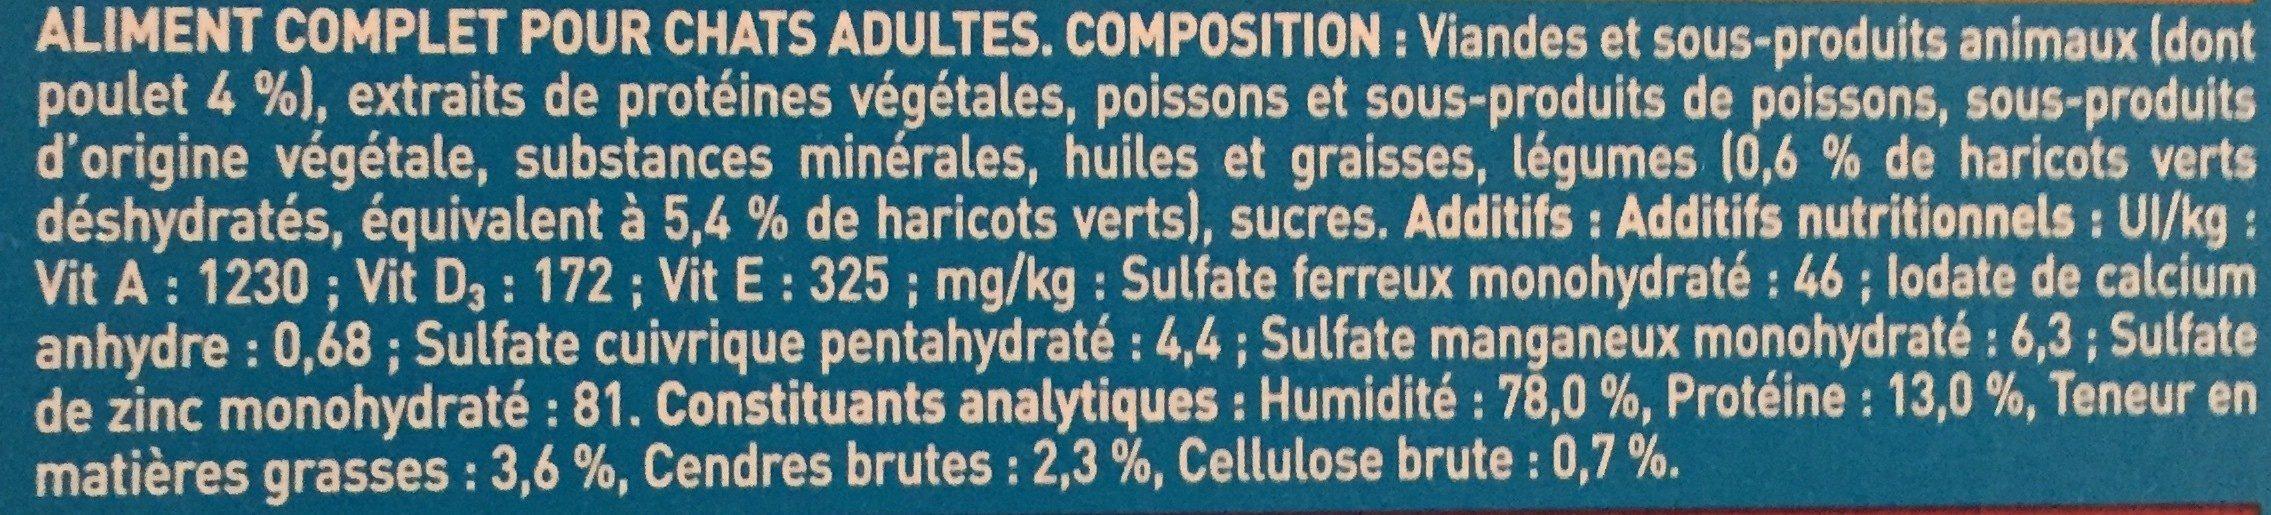 Effilés en sauce - Ingredients